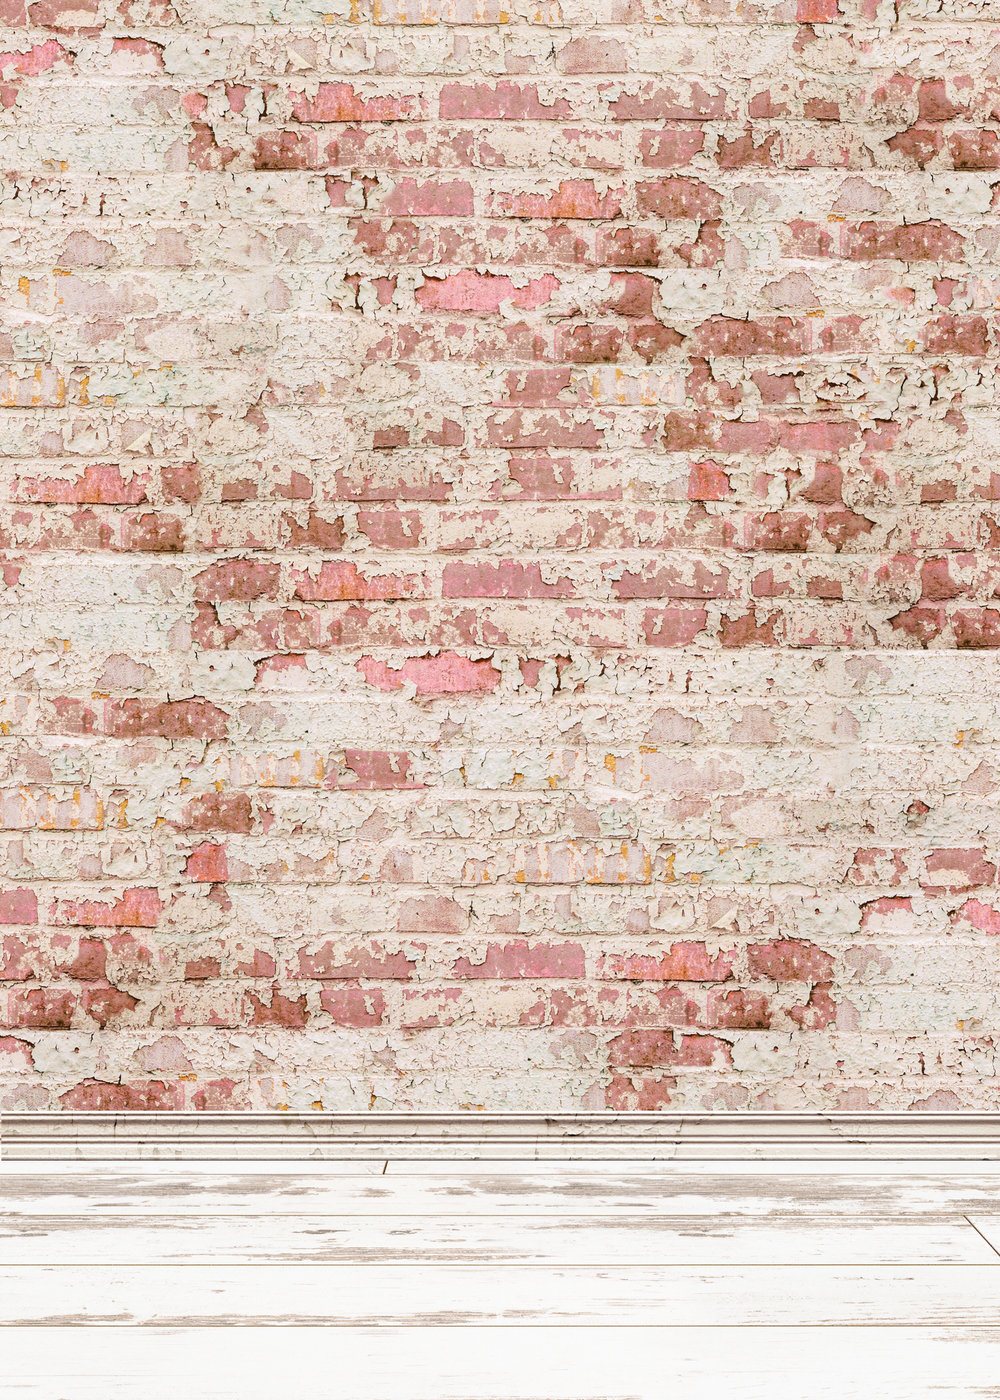 Background K - Pink Brick Wall